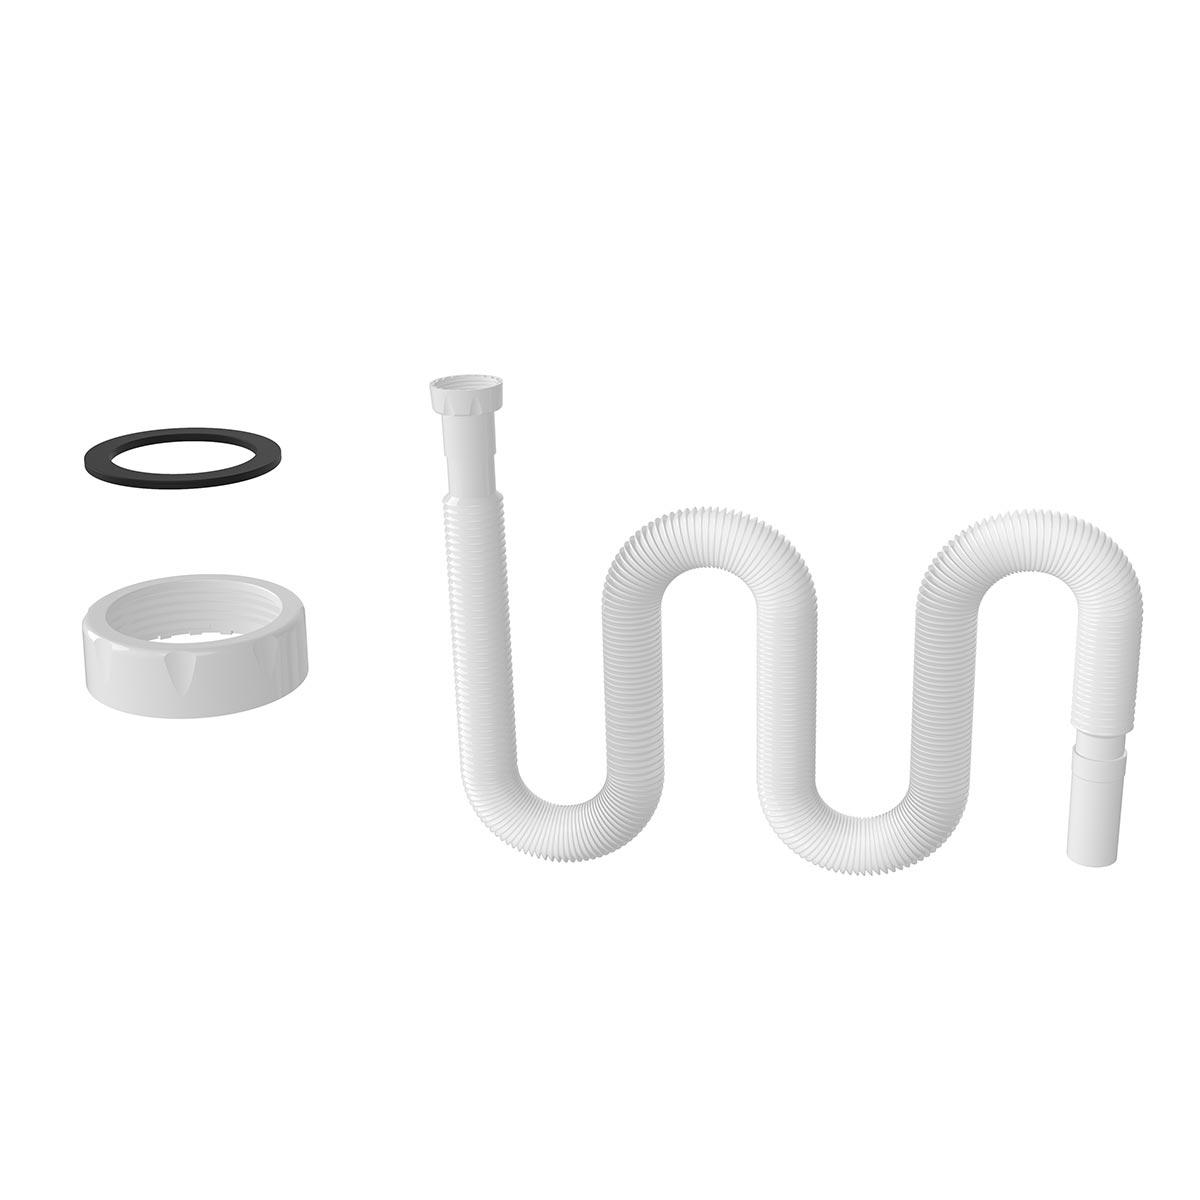 1 ¼ – Ø32 Uzun Körük – Düz Conta